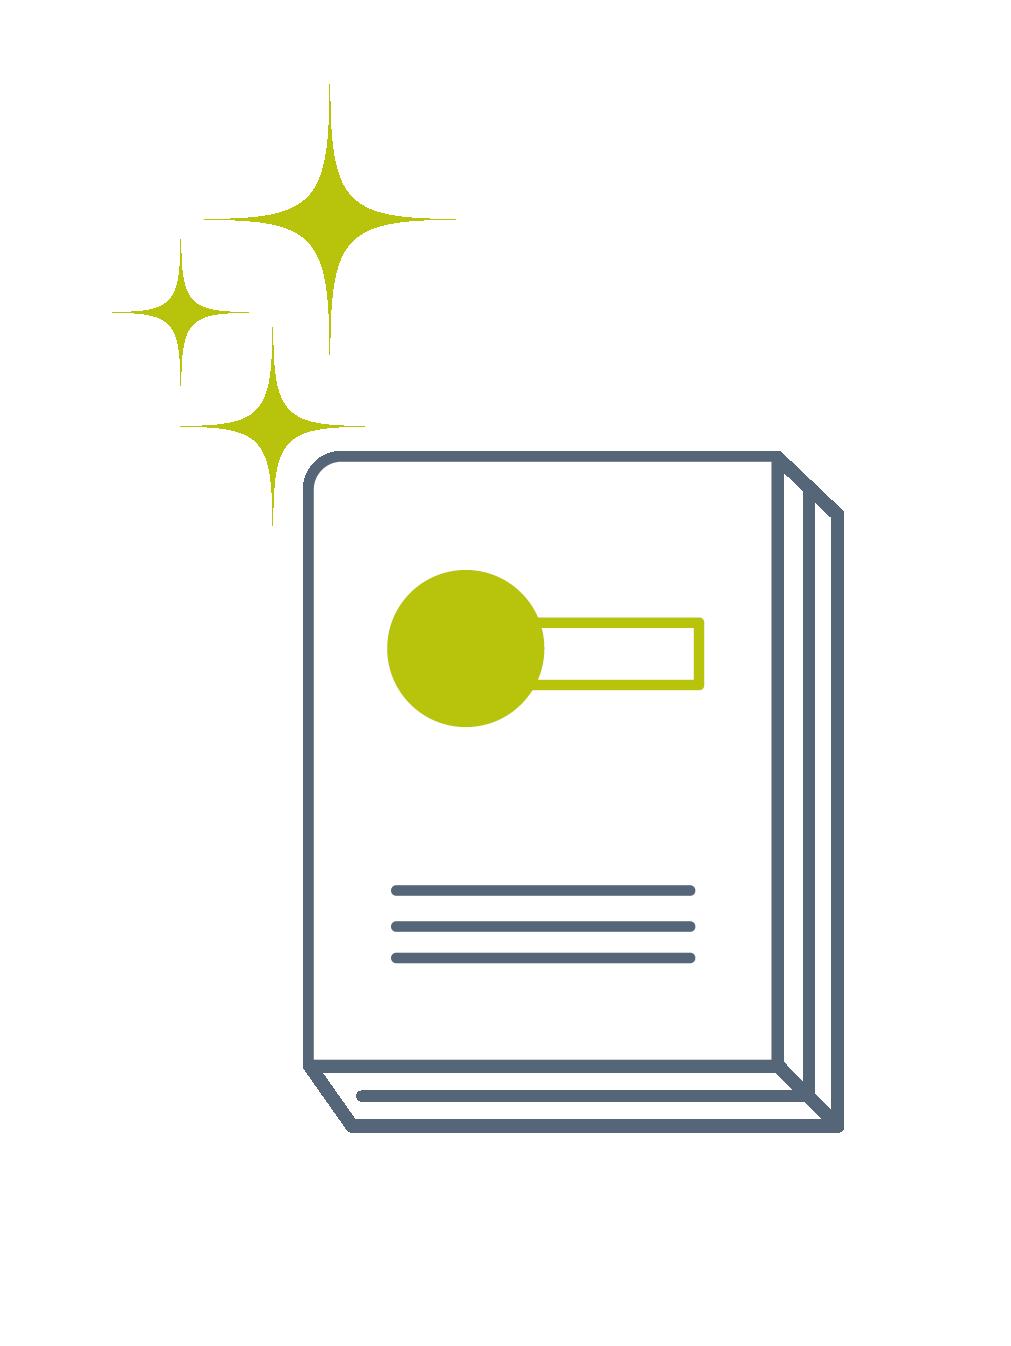 Diagram Icon - GET YOUR BOOKS!